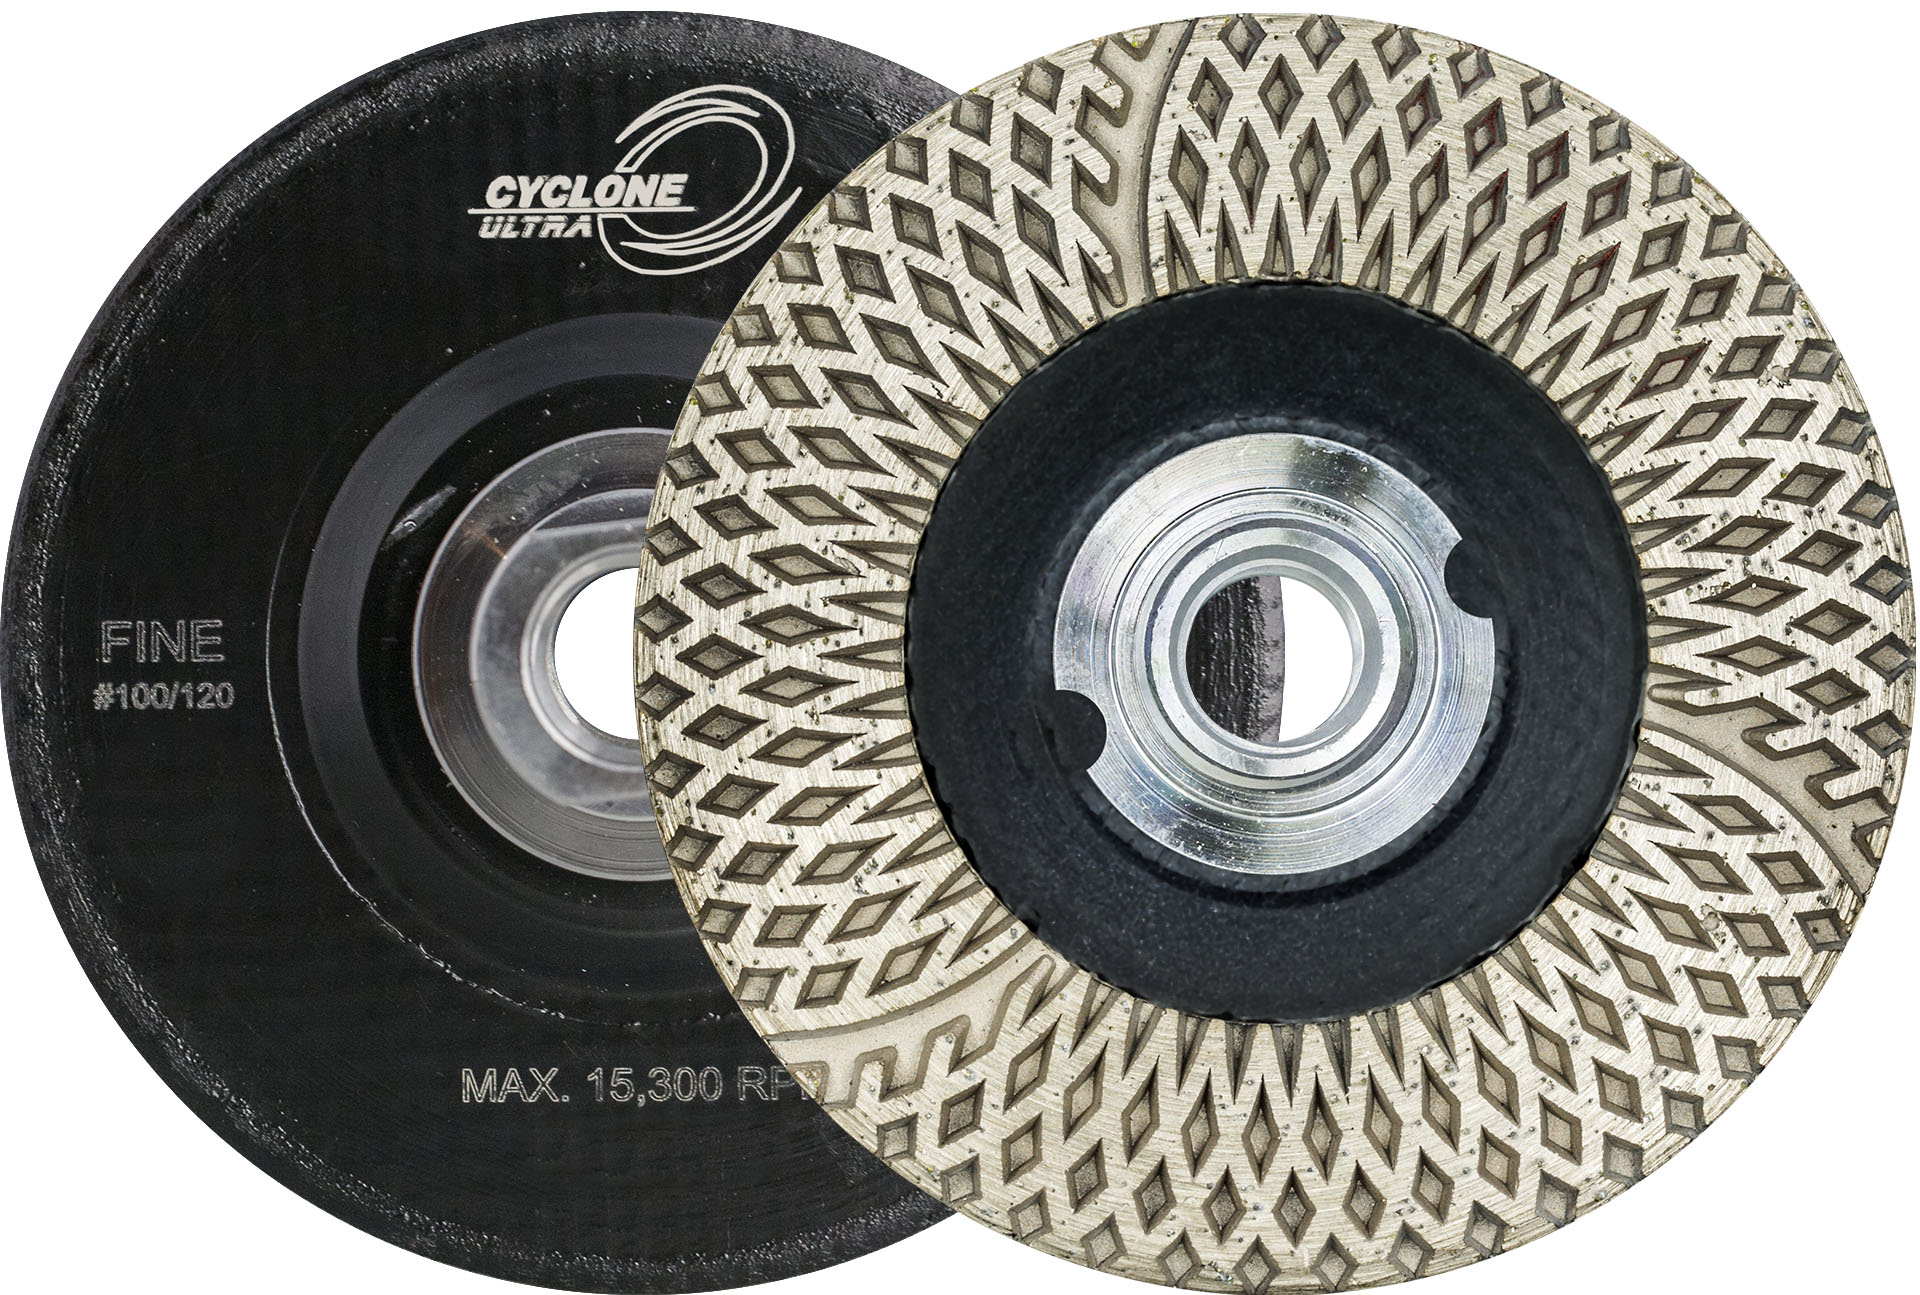 Cyclone Ultra Cup Wheel